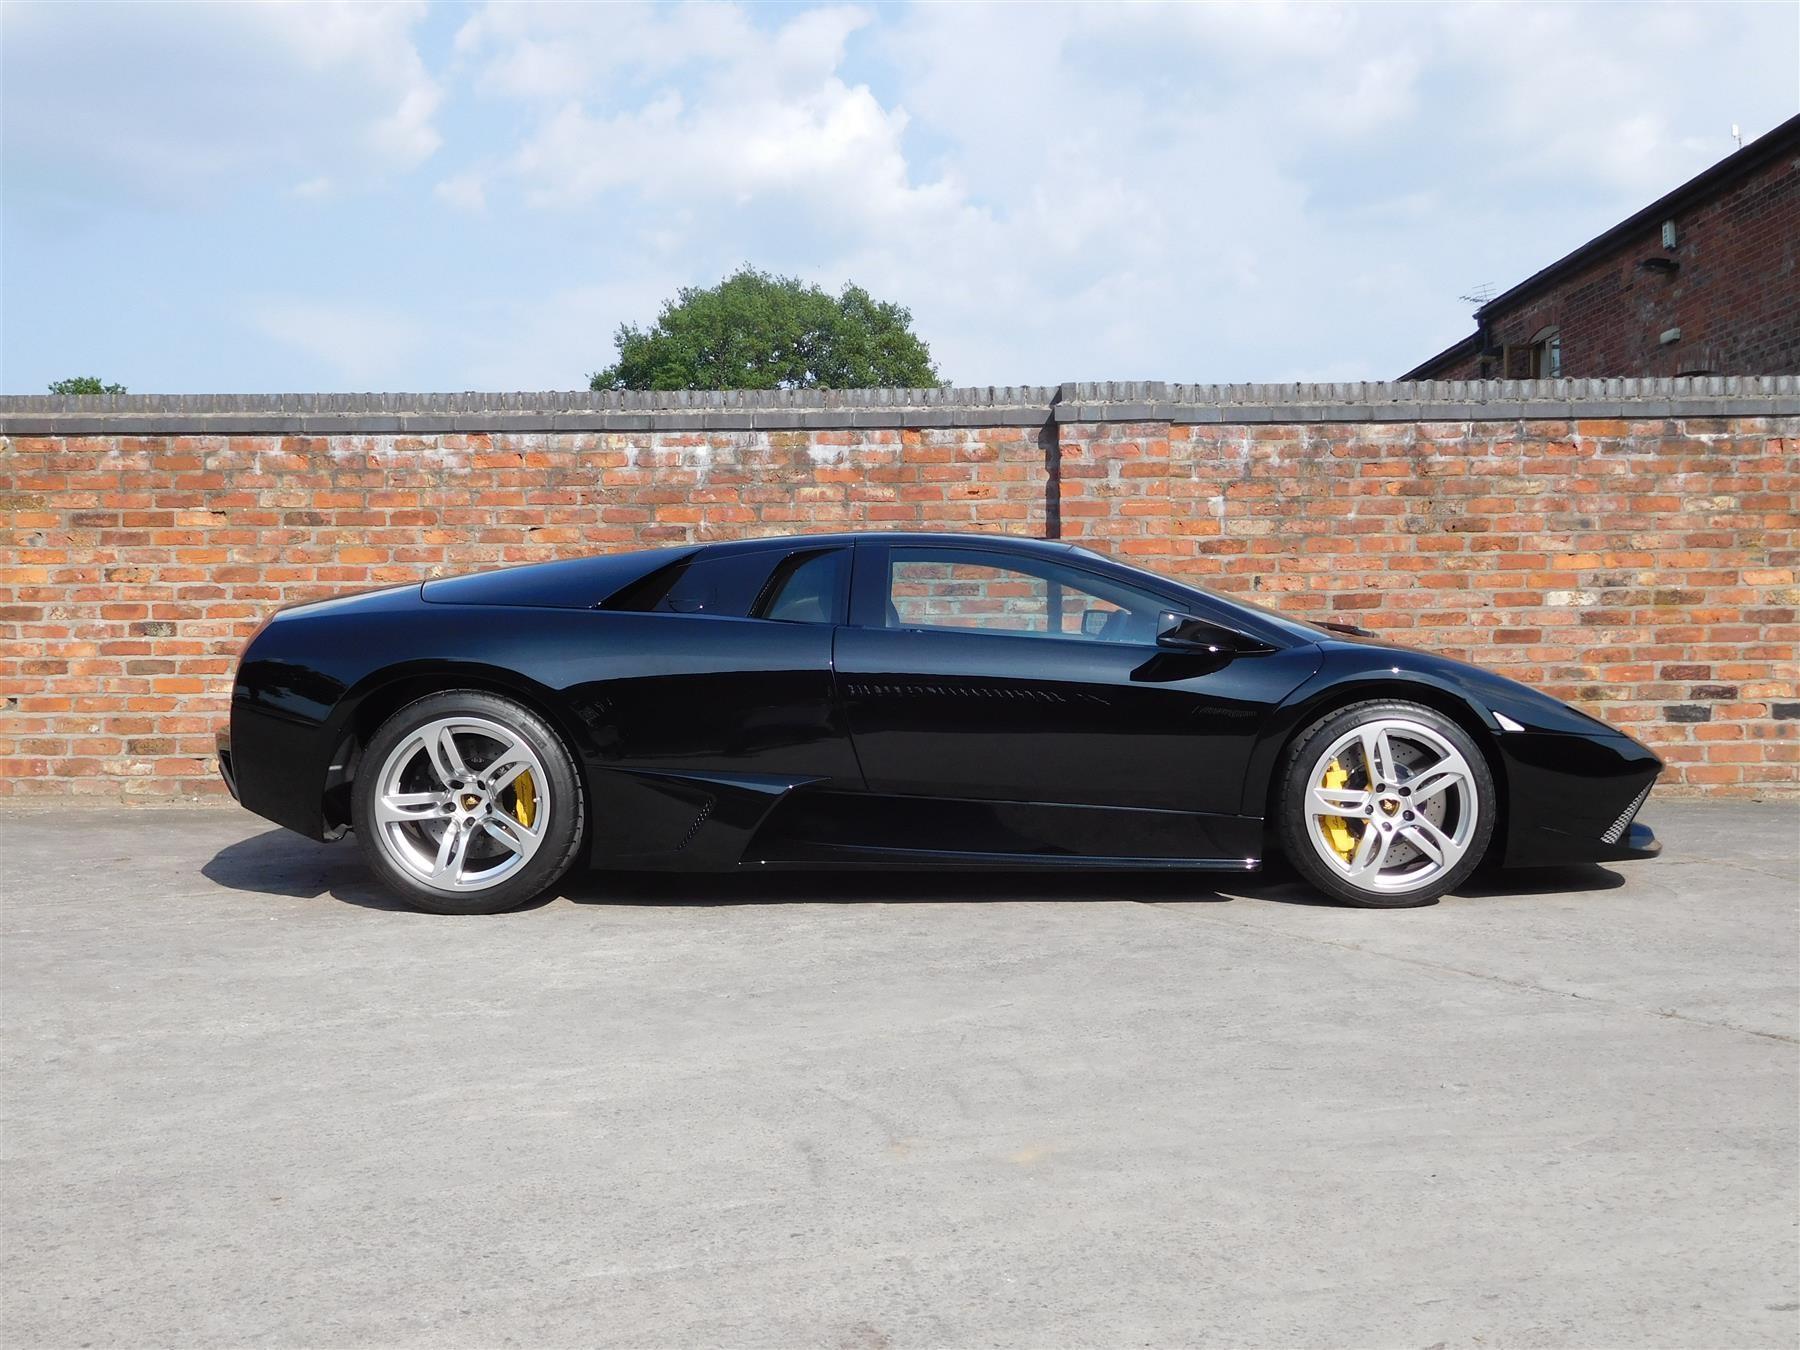 2007_Lamborghini_Murcielago_sale-0004